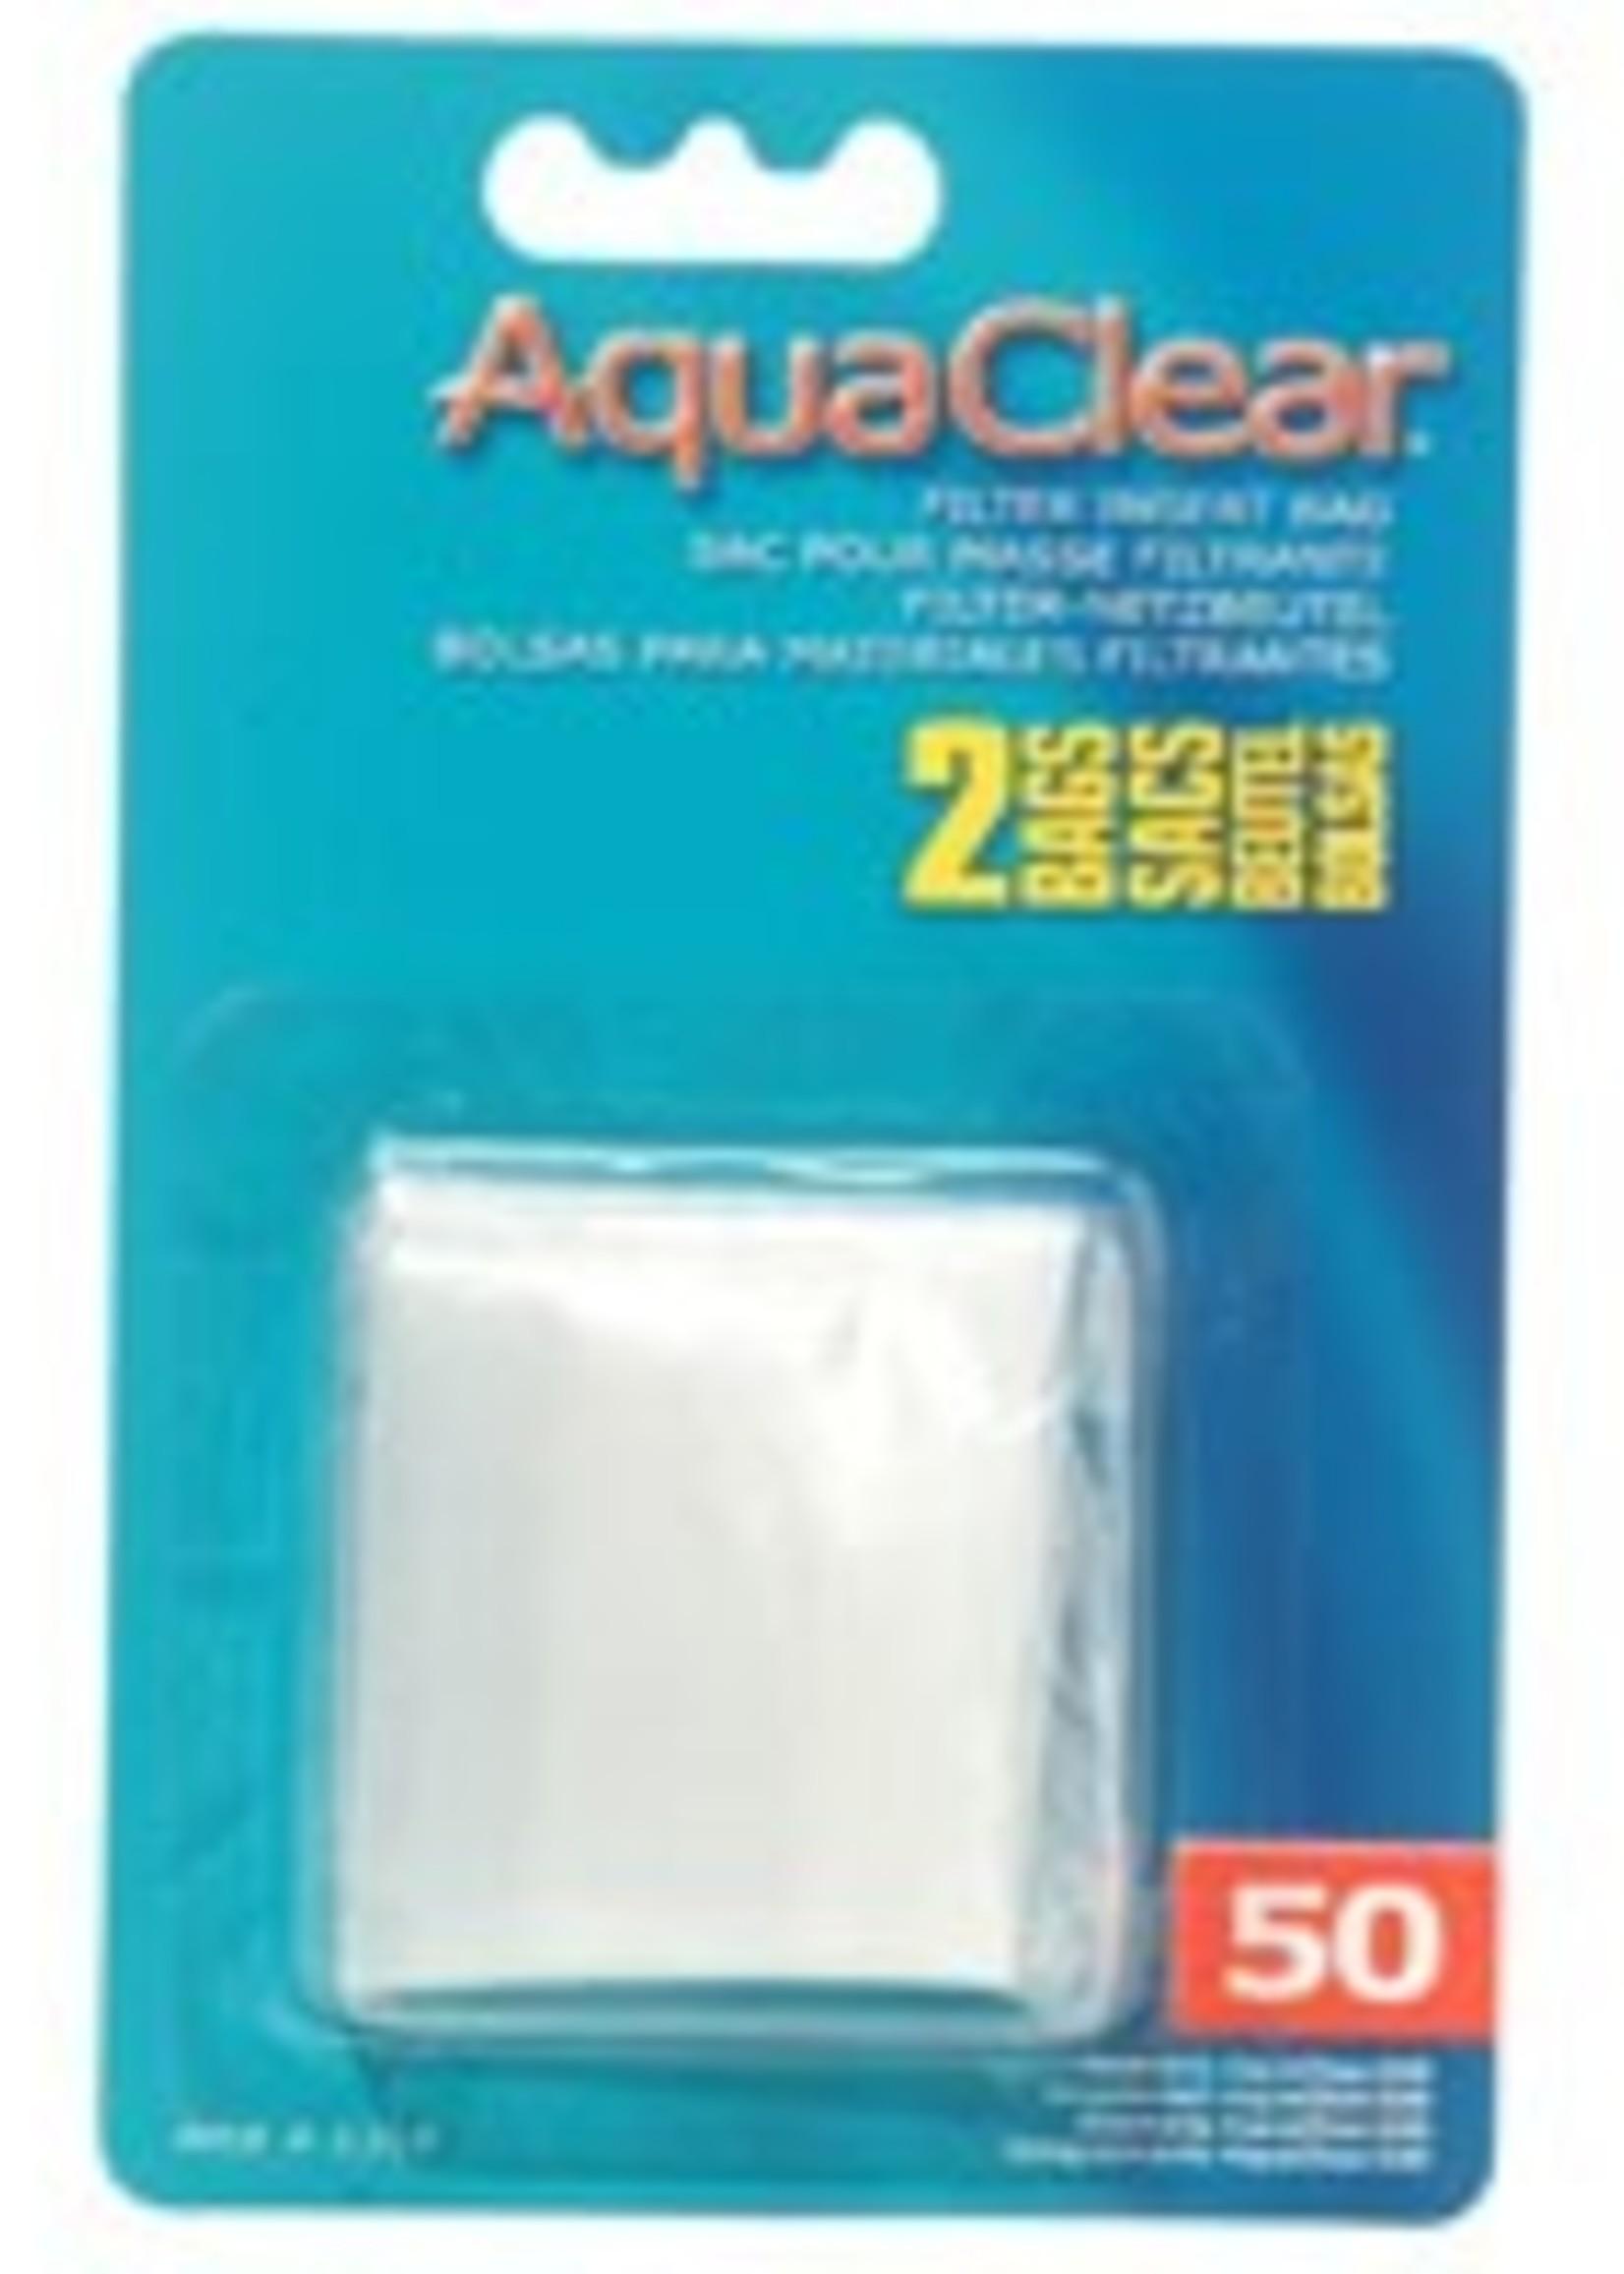 AquaClear Nylon Filter Media Bags for AquaClear 50 Power Filter, 2 pack